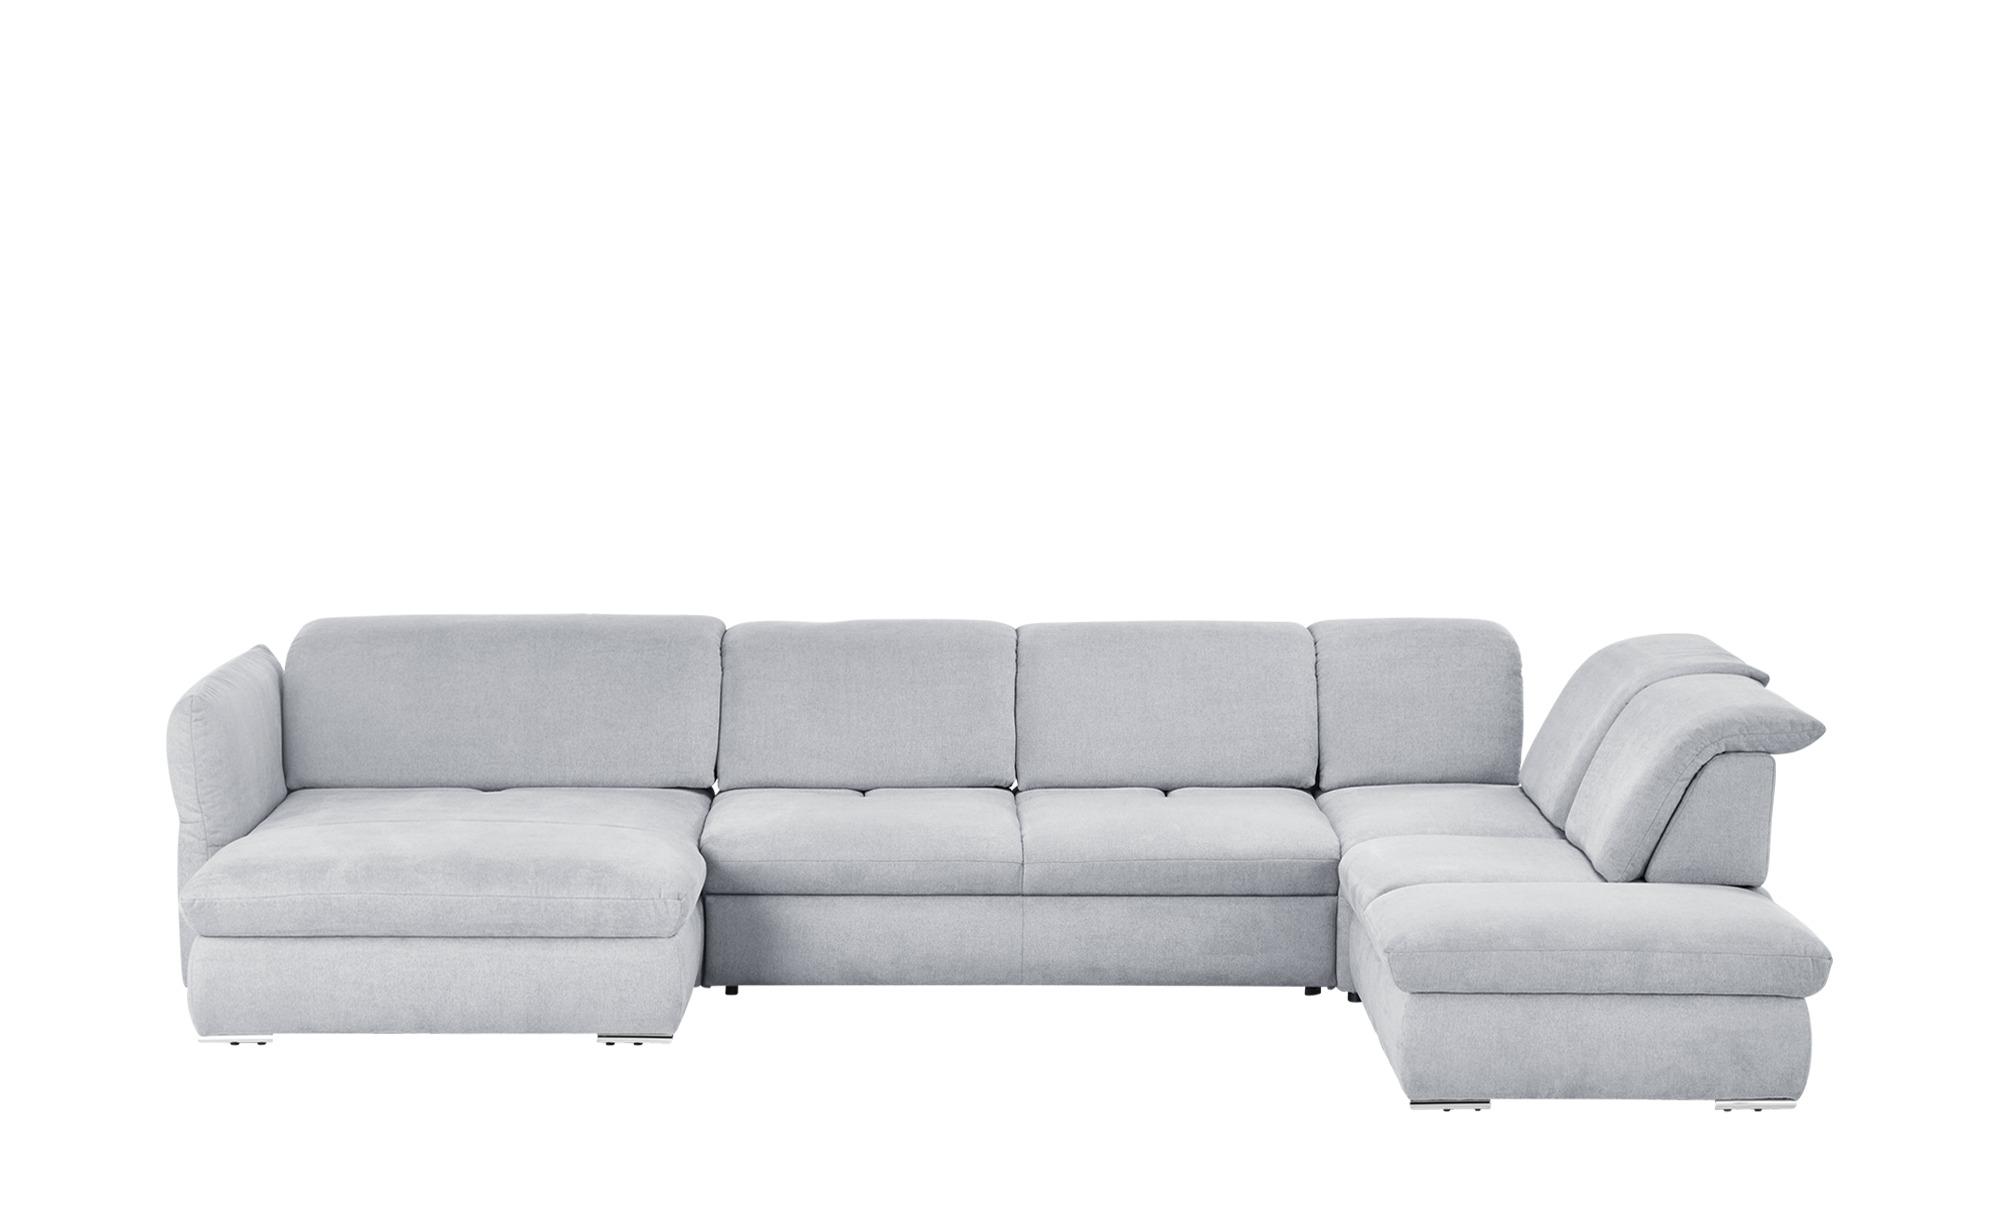 Sofa Grau Breite Sitzflache Smart Schlafsofa Babette Breite 196 Cm